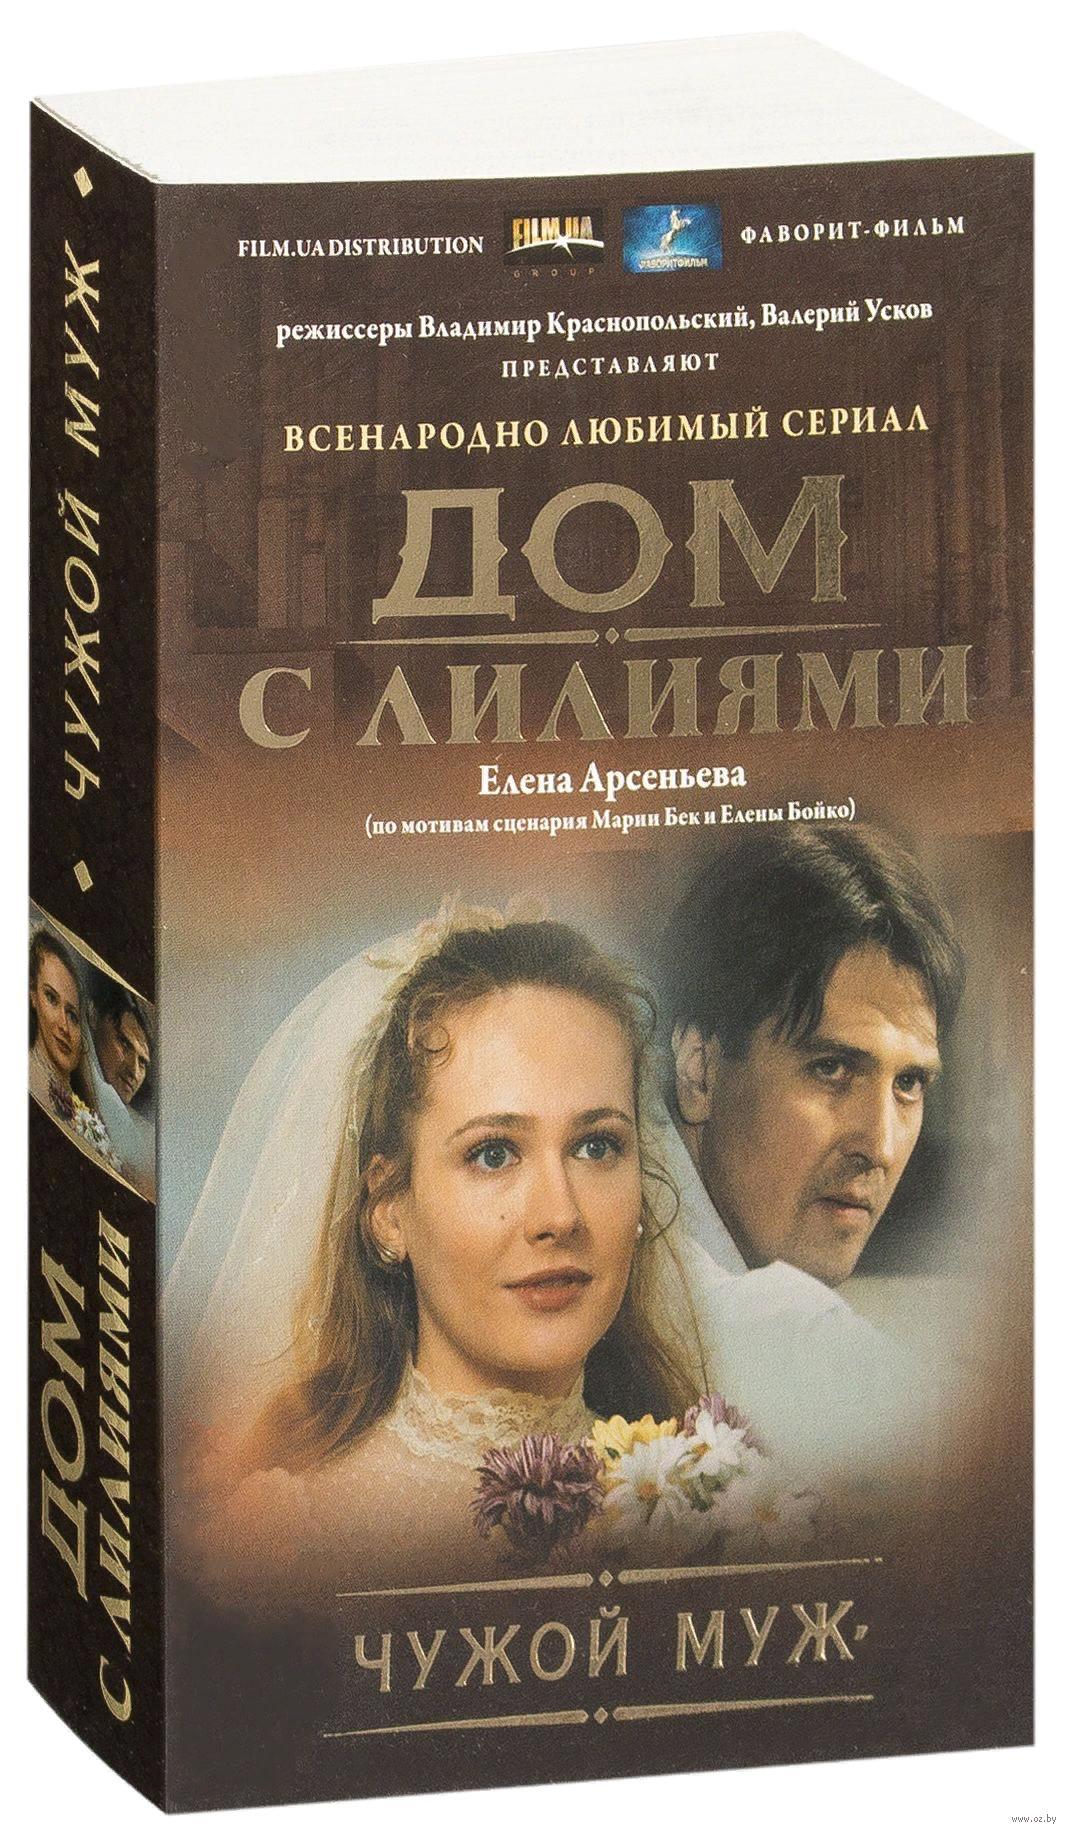 Чужой муж. Елена Арсеньева